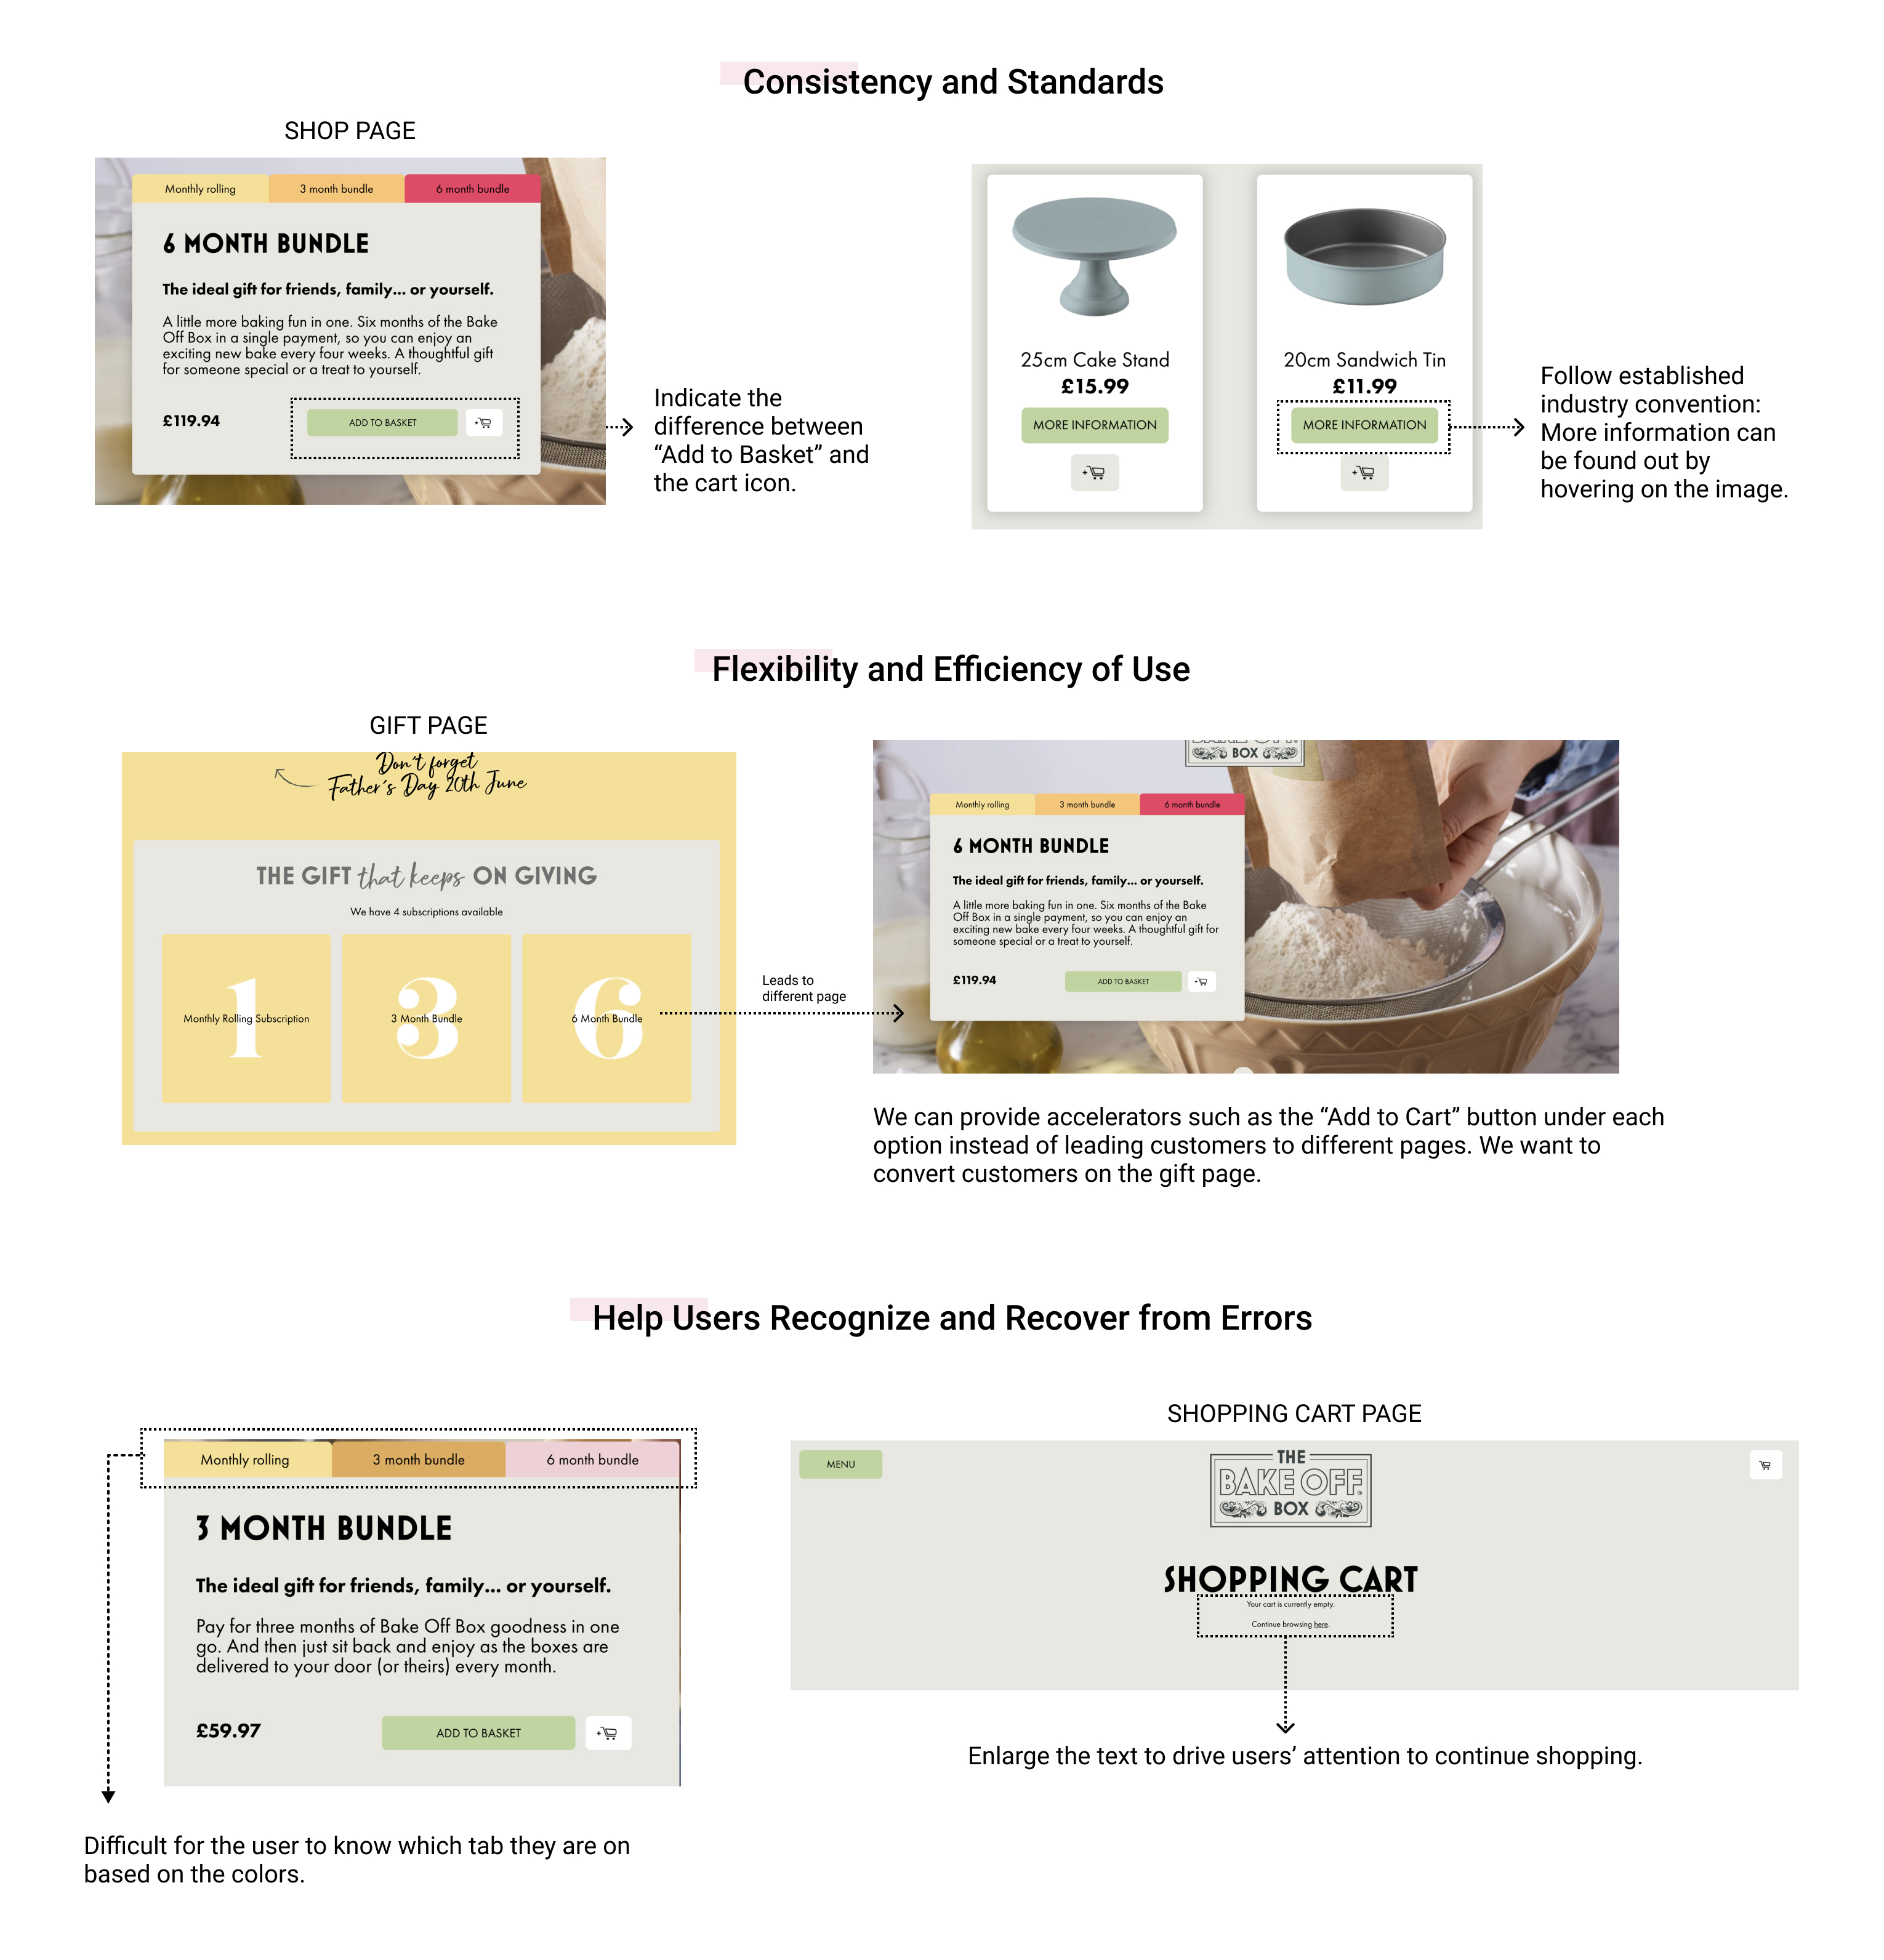 The Bake Off Box - Baking Subscription eCommerce